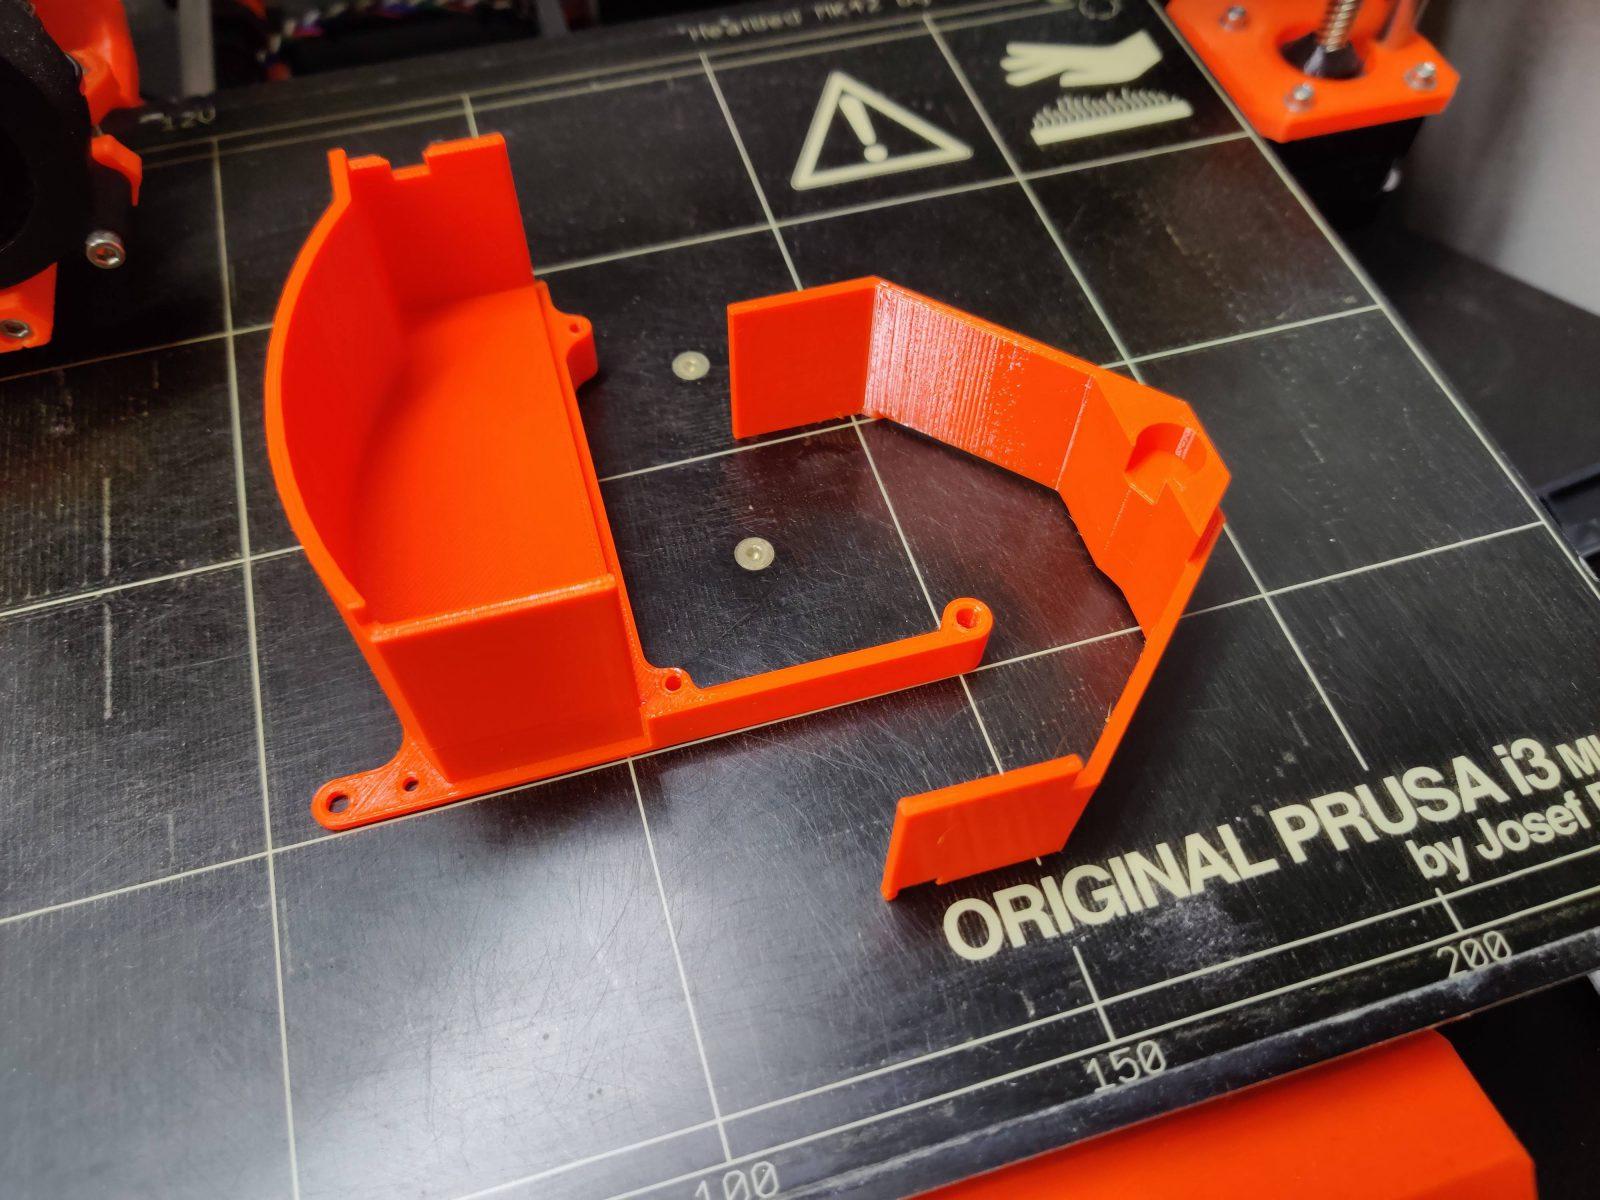 GDEMU 3D printed parts